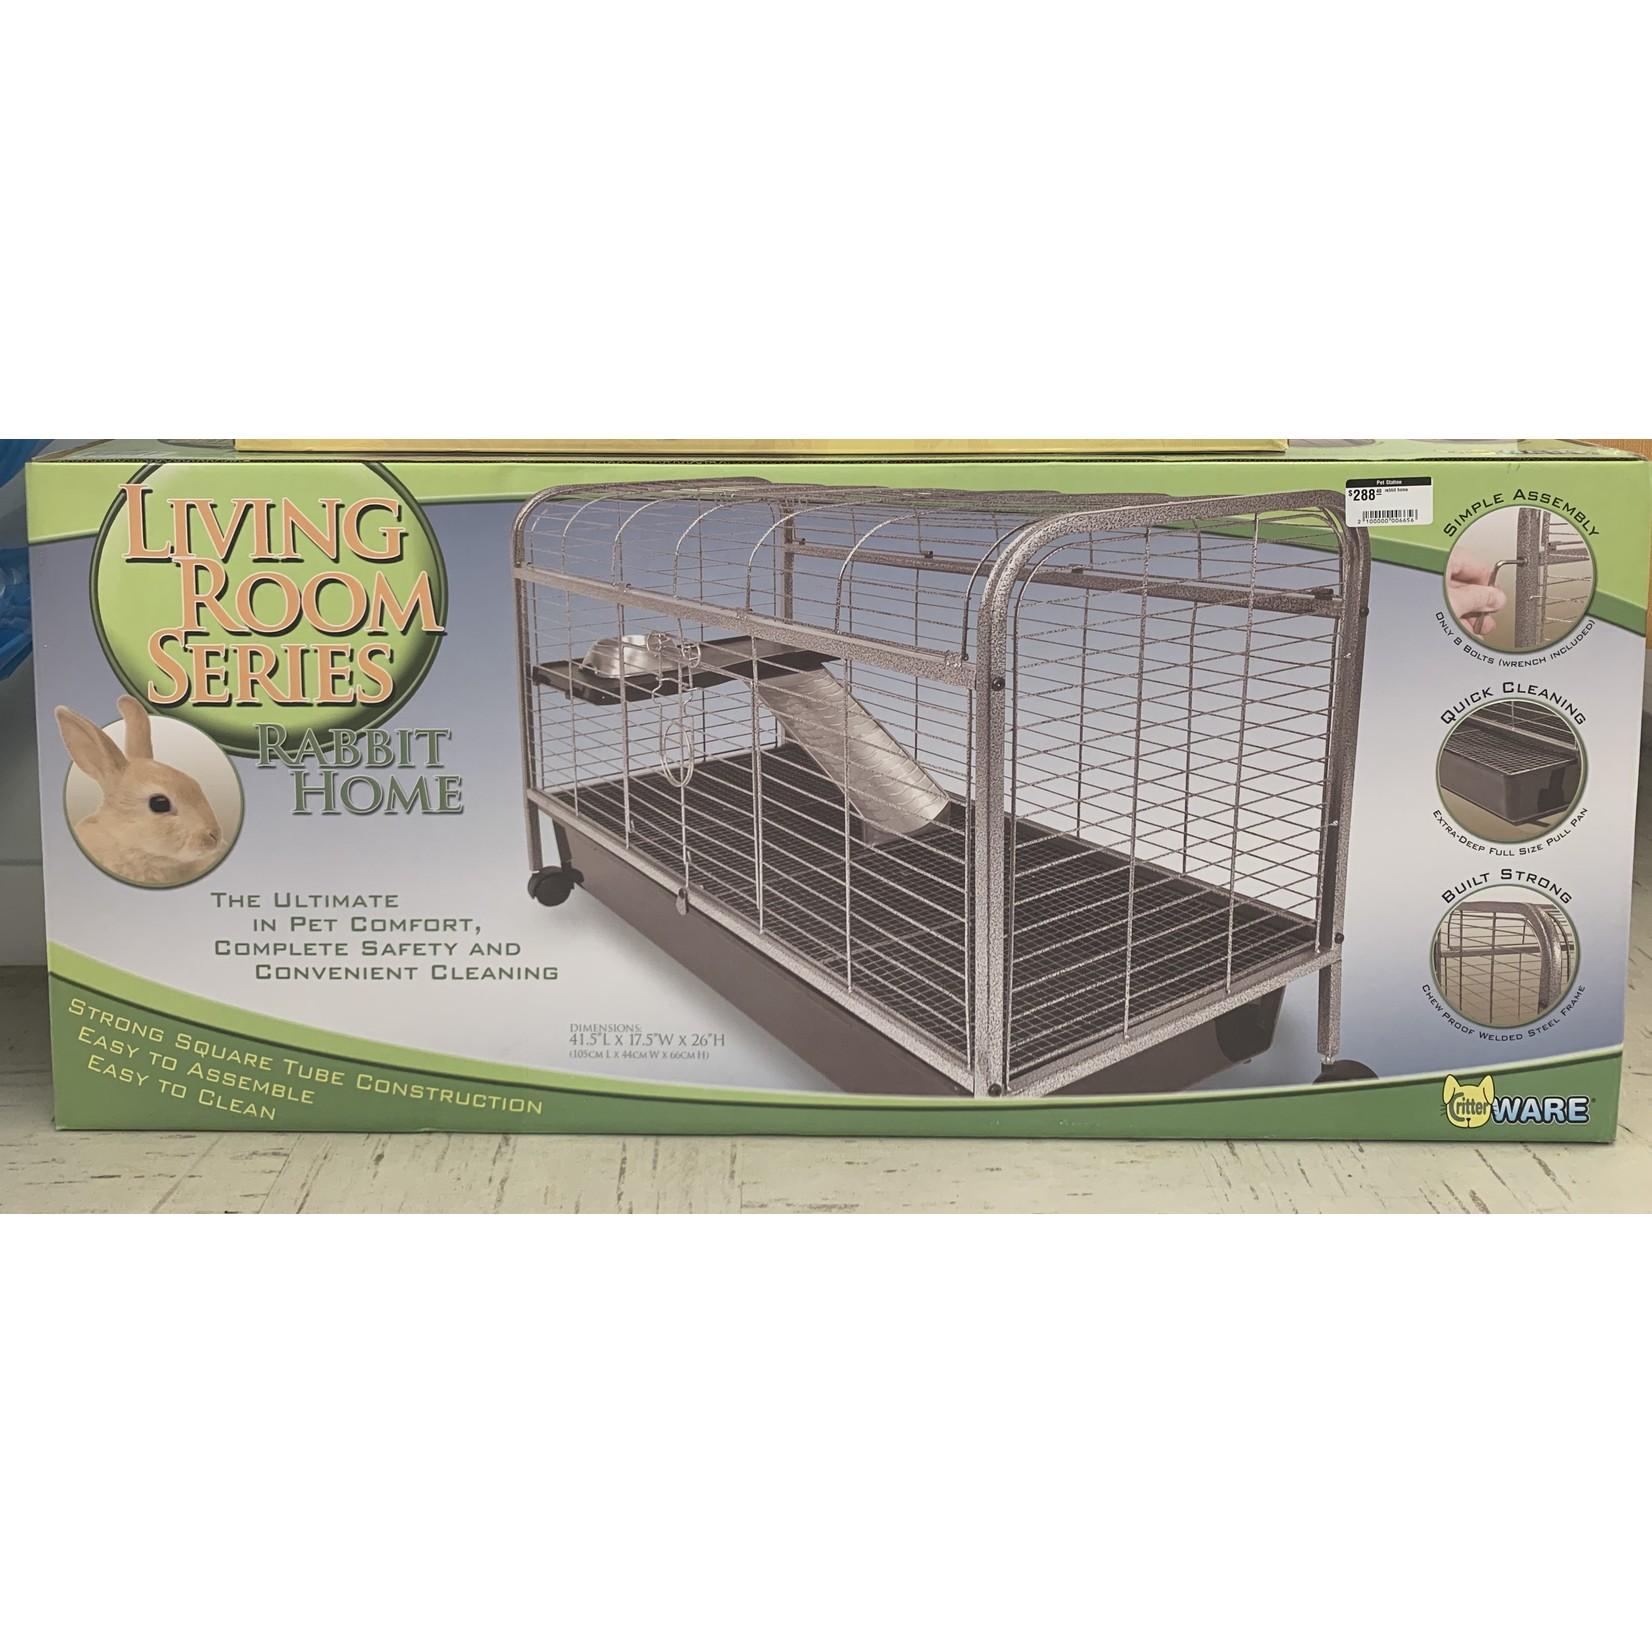 Rabbit Home Living Room Series